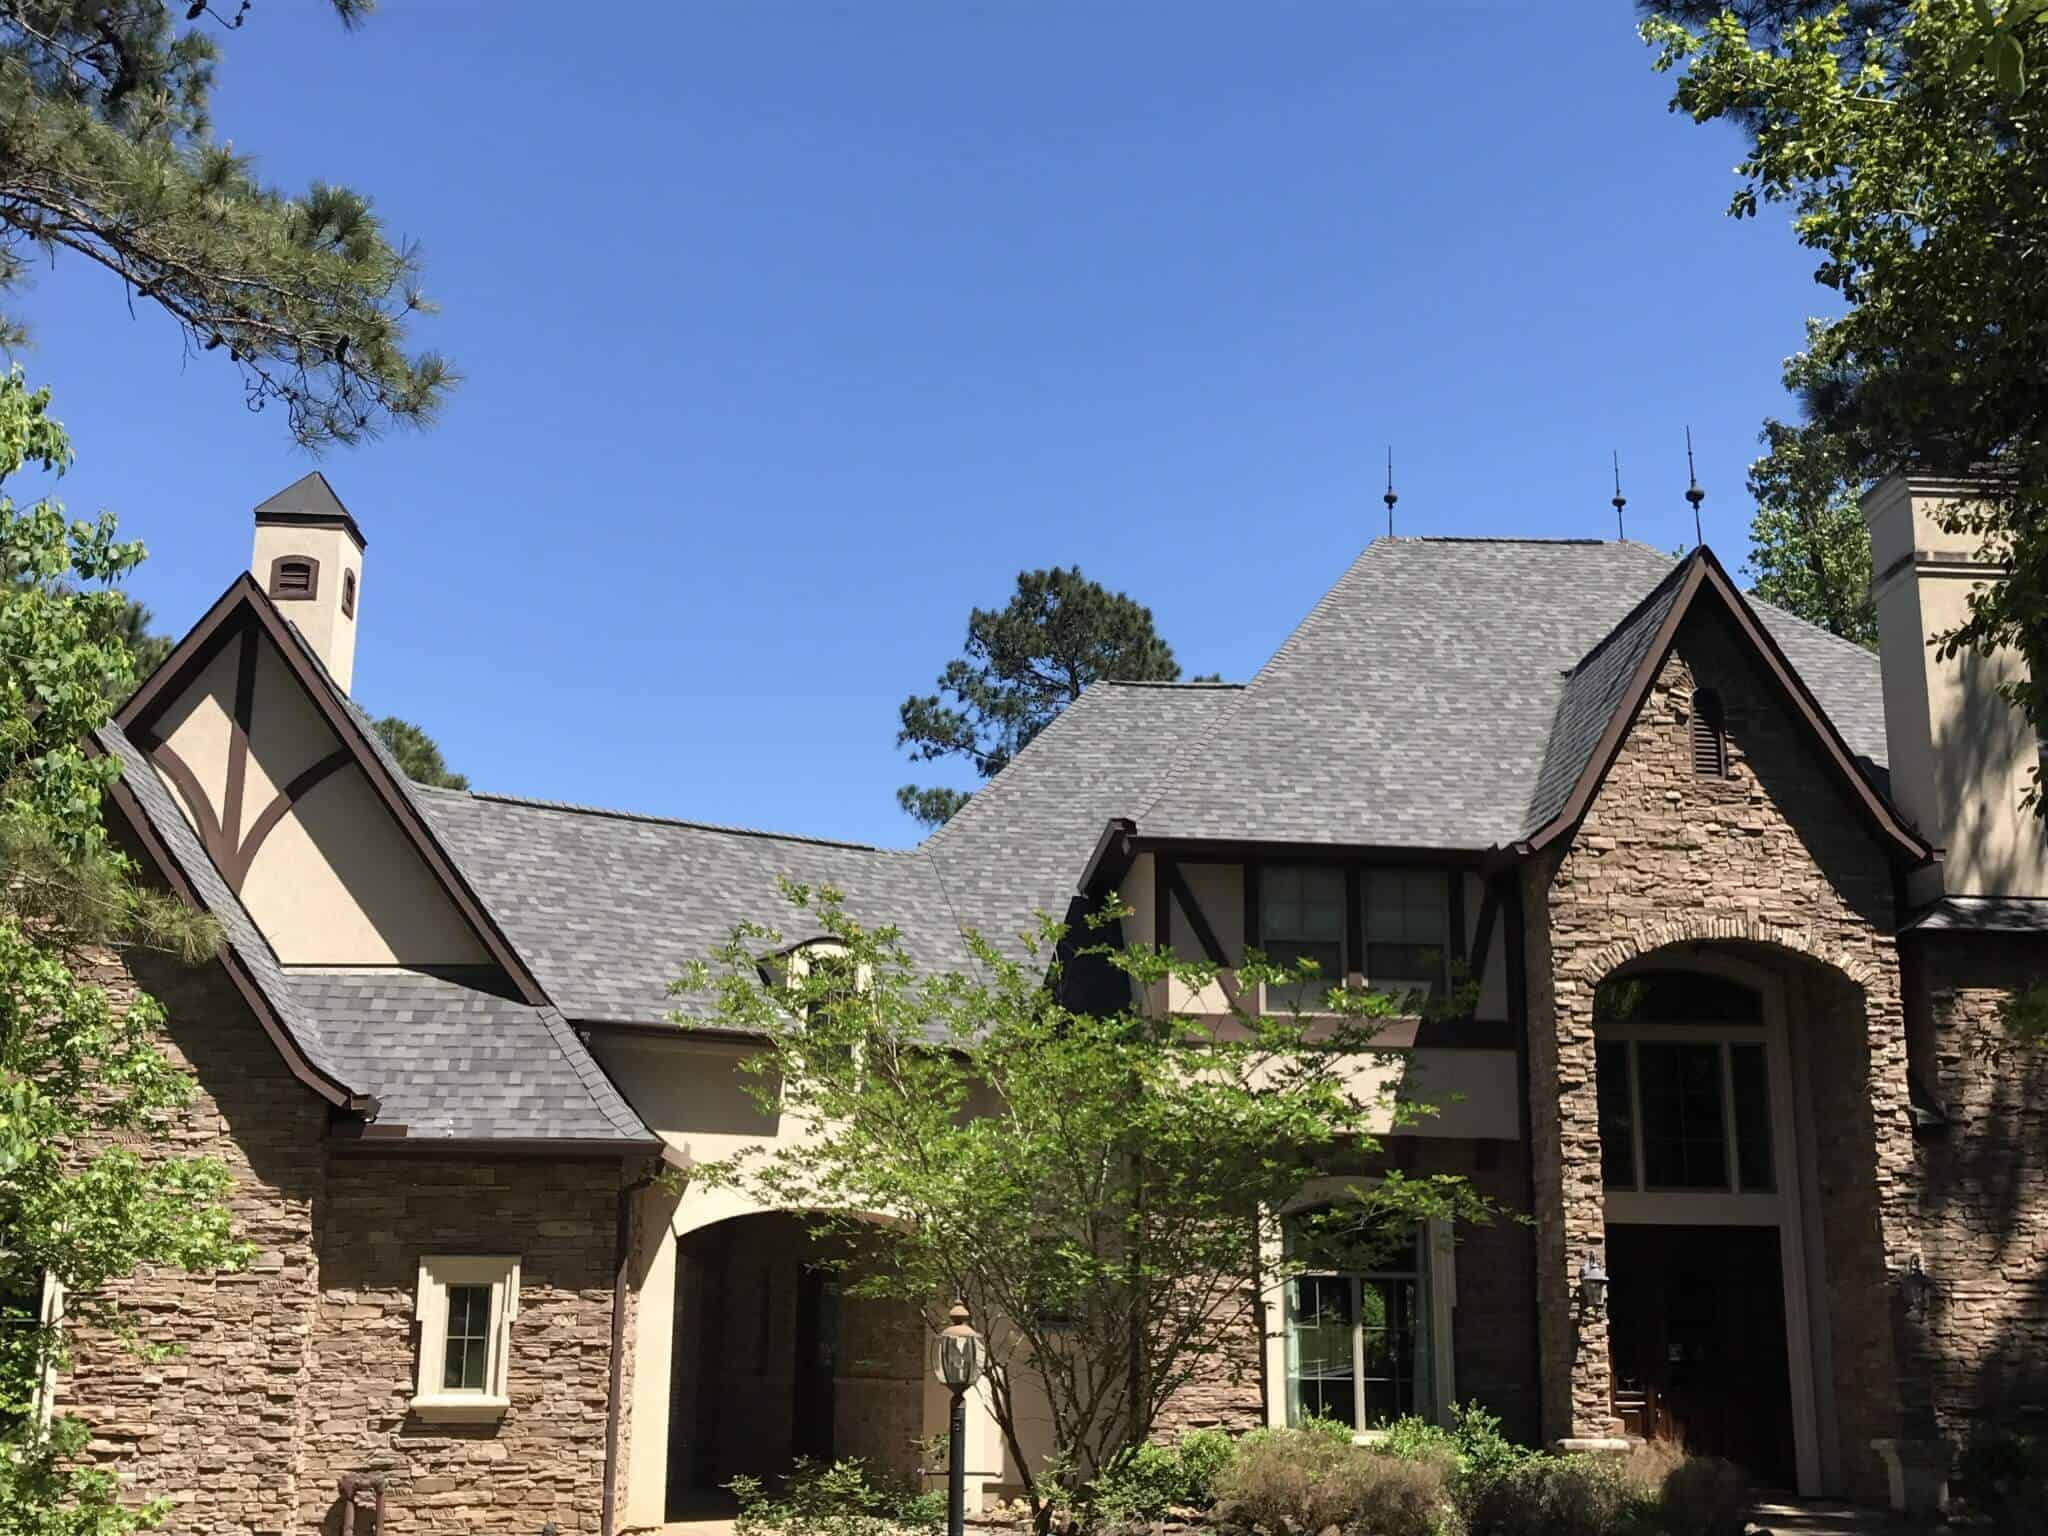 Owens Corning - Estate Gray